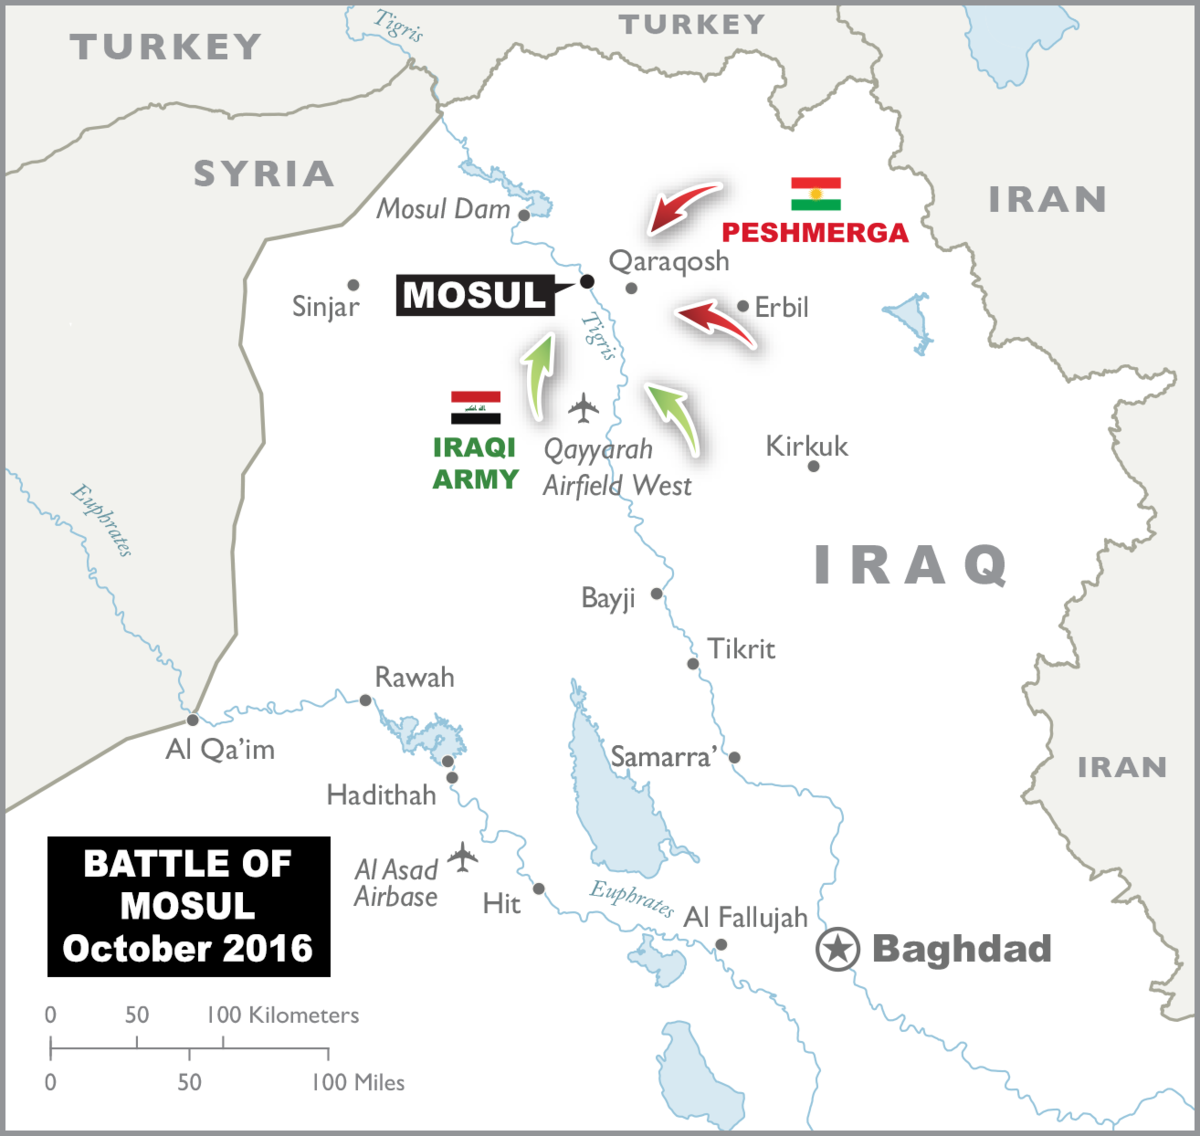 Shingal Irak Karte.Schlacht Um Mossul Wikipedia